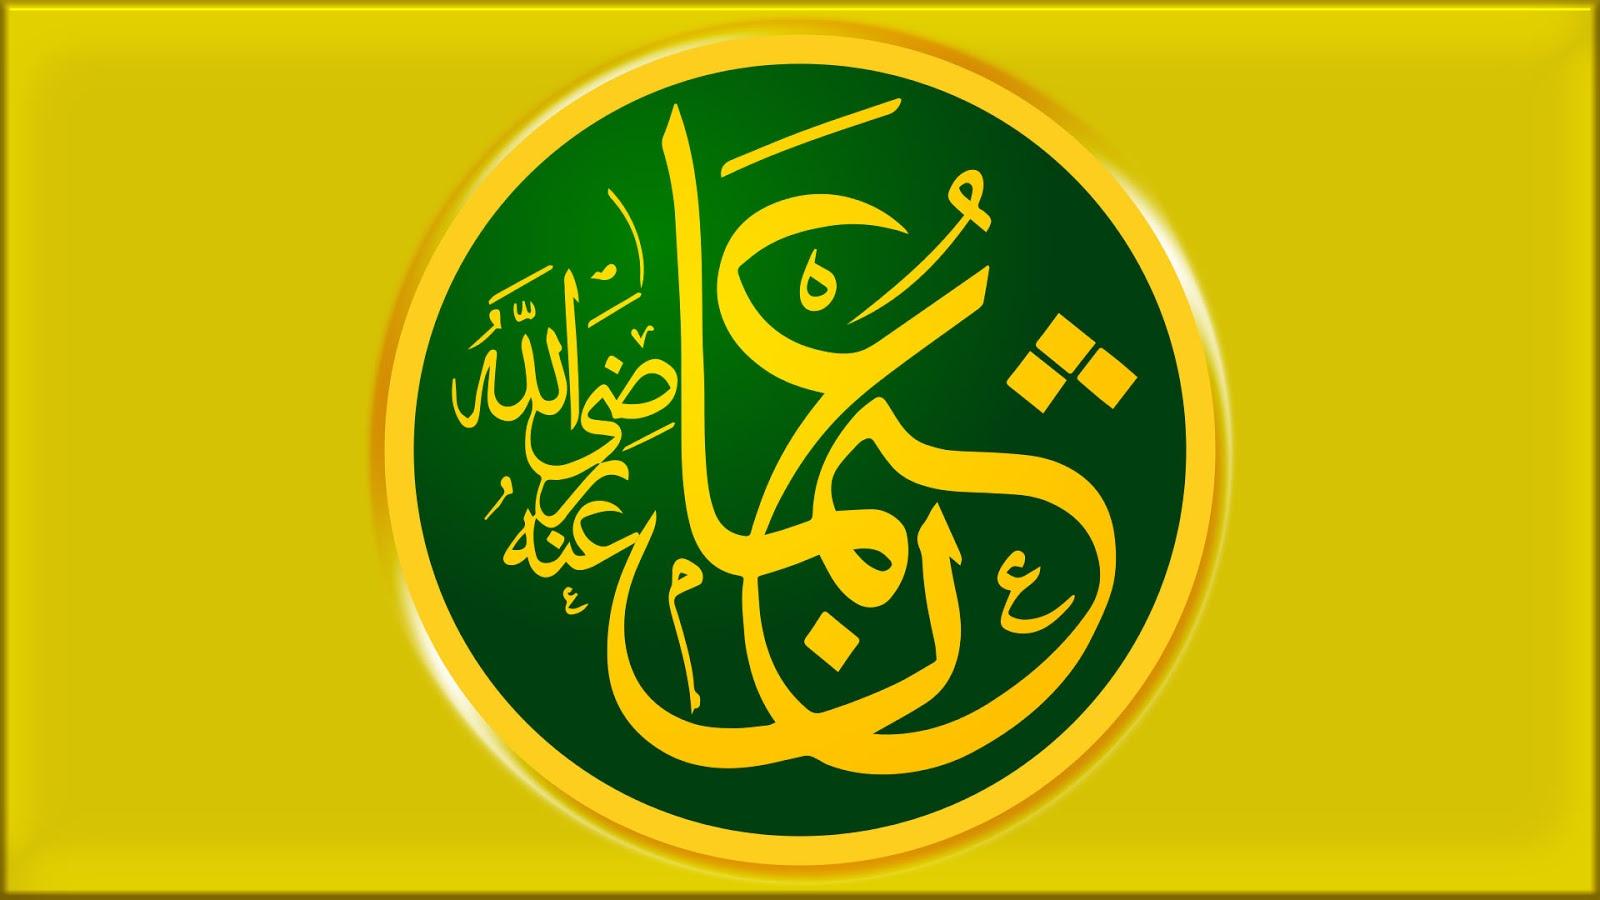 Uthman Ibn Affan islamic calligraphy